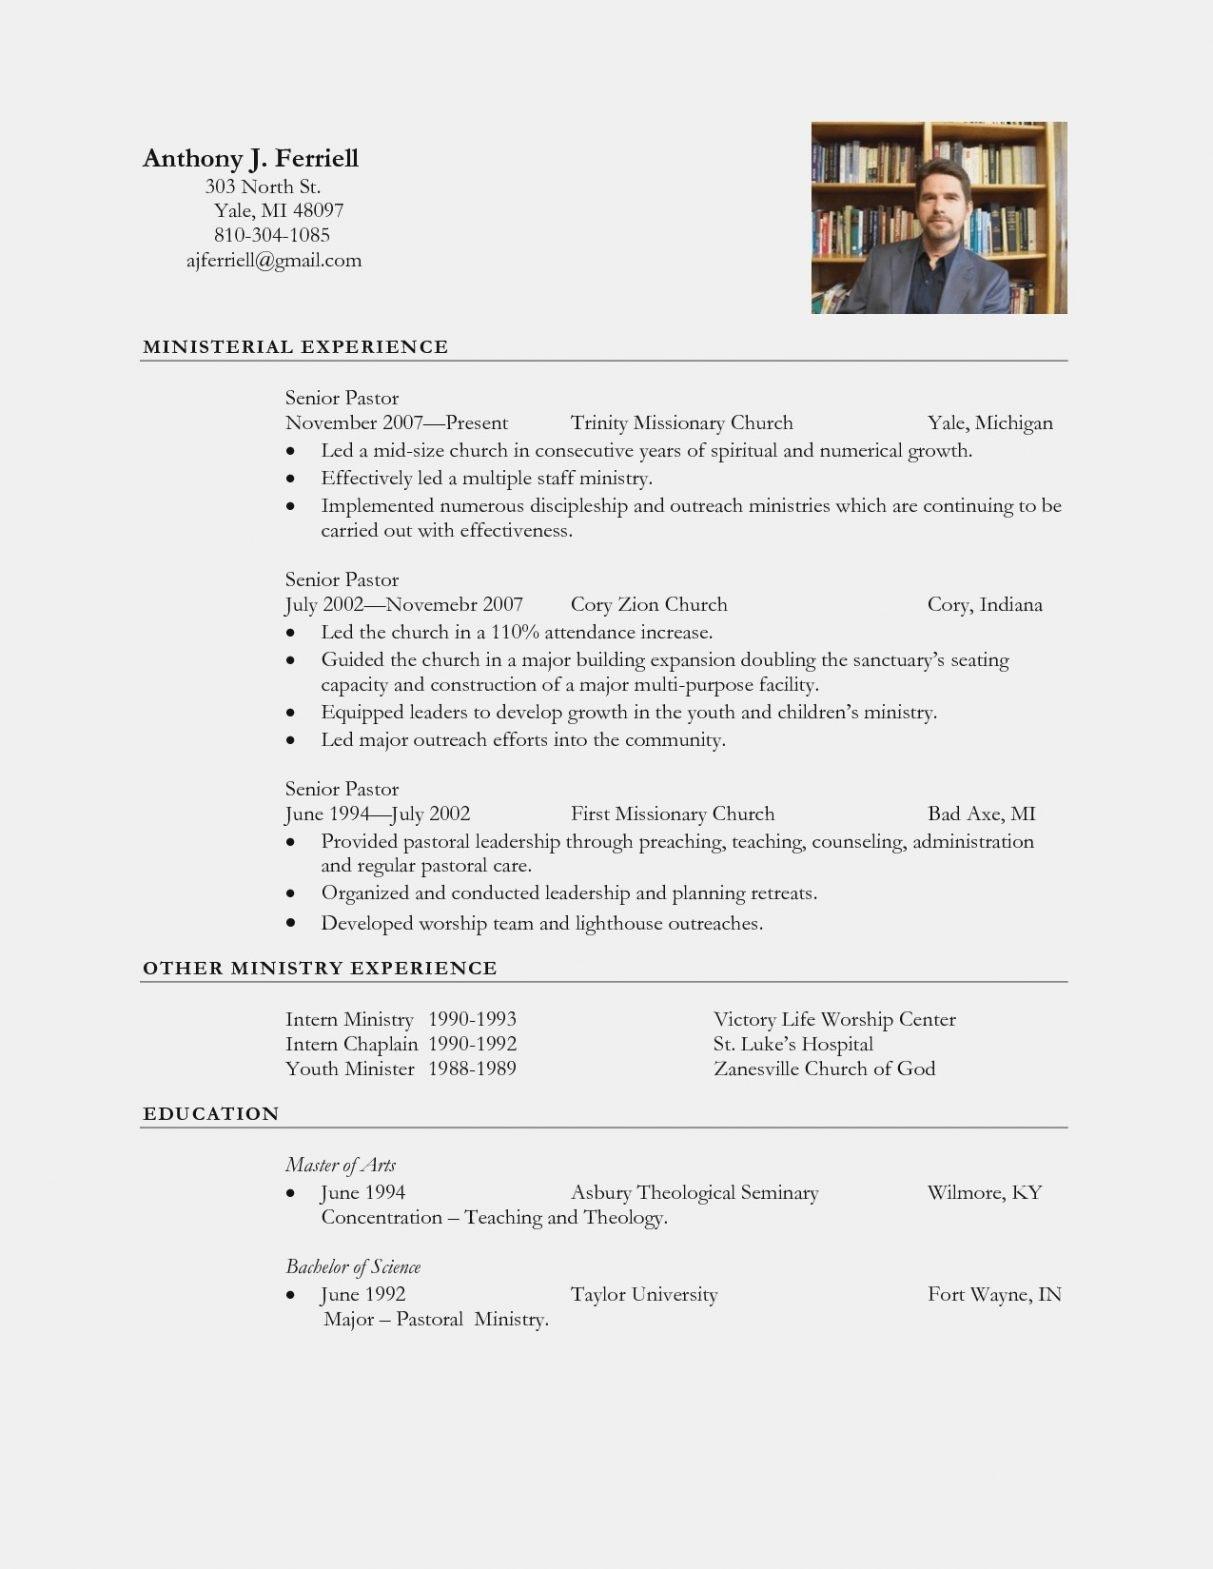 youth minister resume youth minister resume objective 2019 youth ministry resume examples youth ministry resume youth ministry resume samples 2020 youth pastor resume youth pastor resume sample